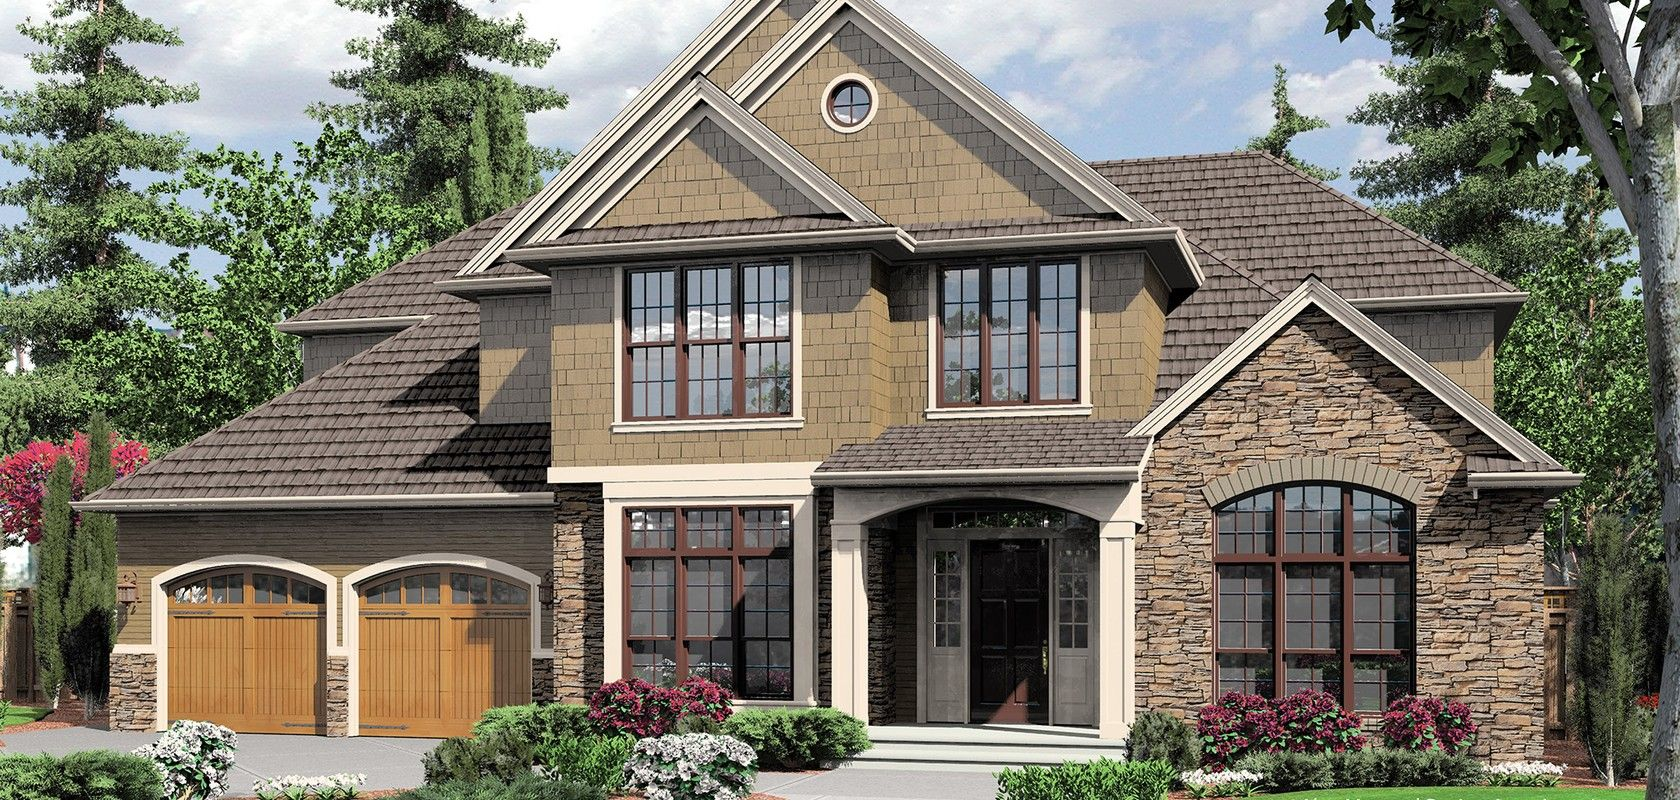 mascord house plan 2363ea the bradner craftsman style